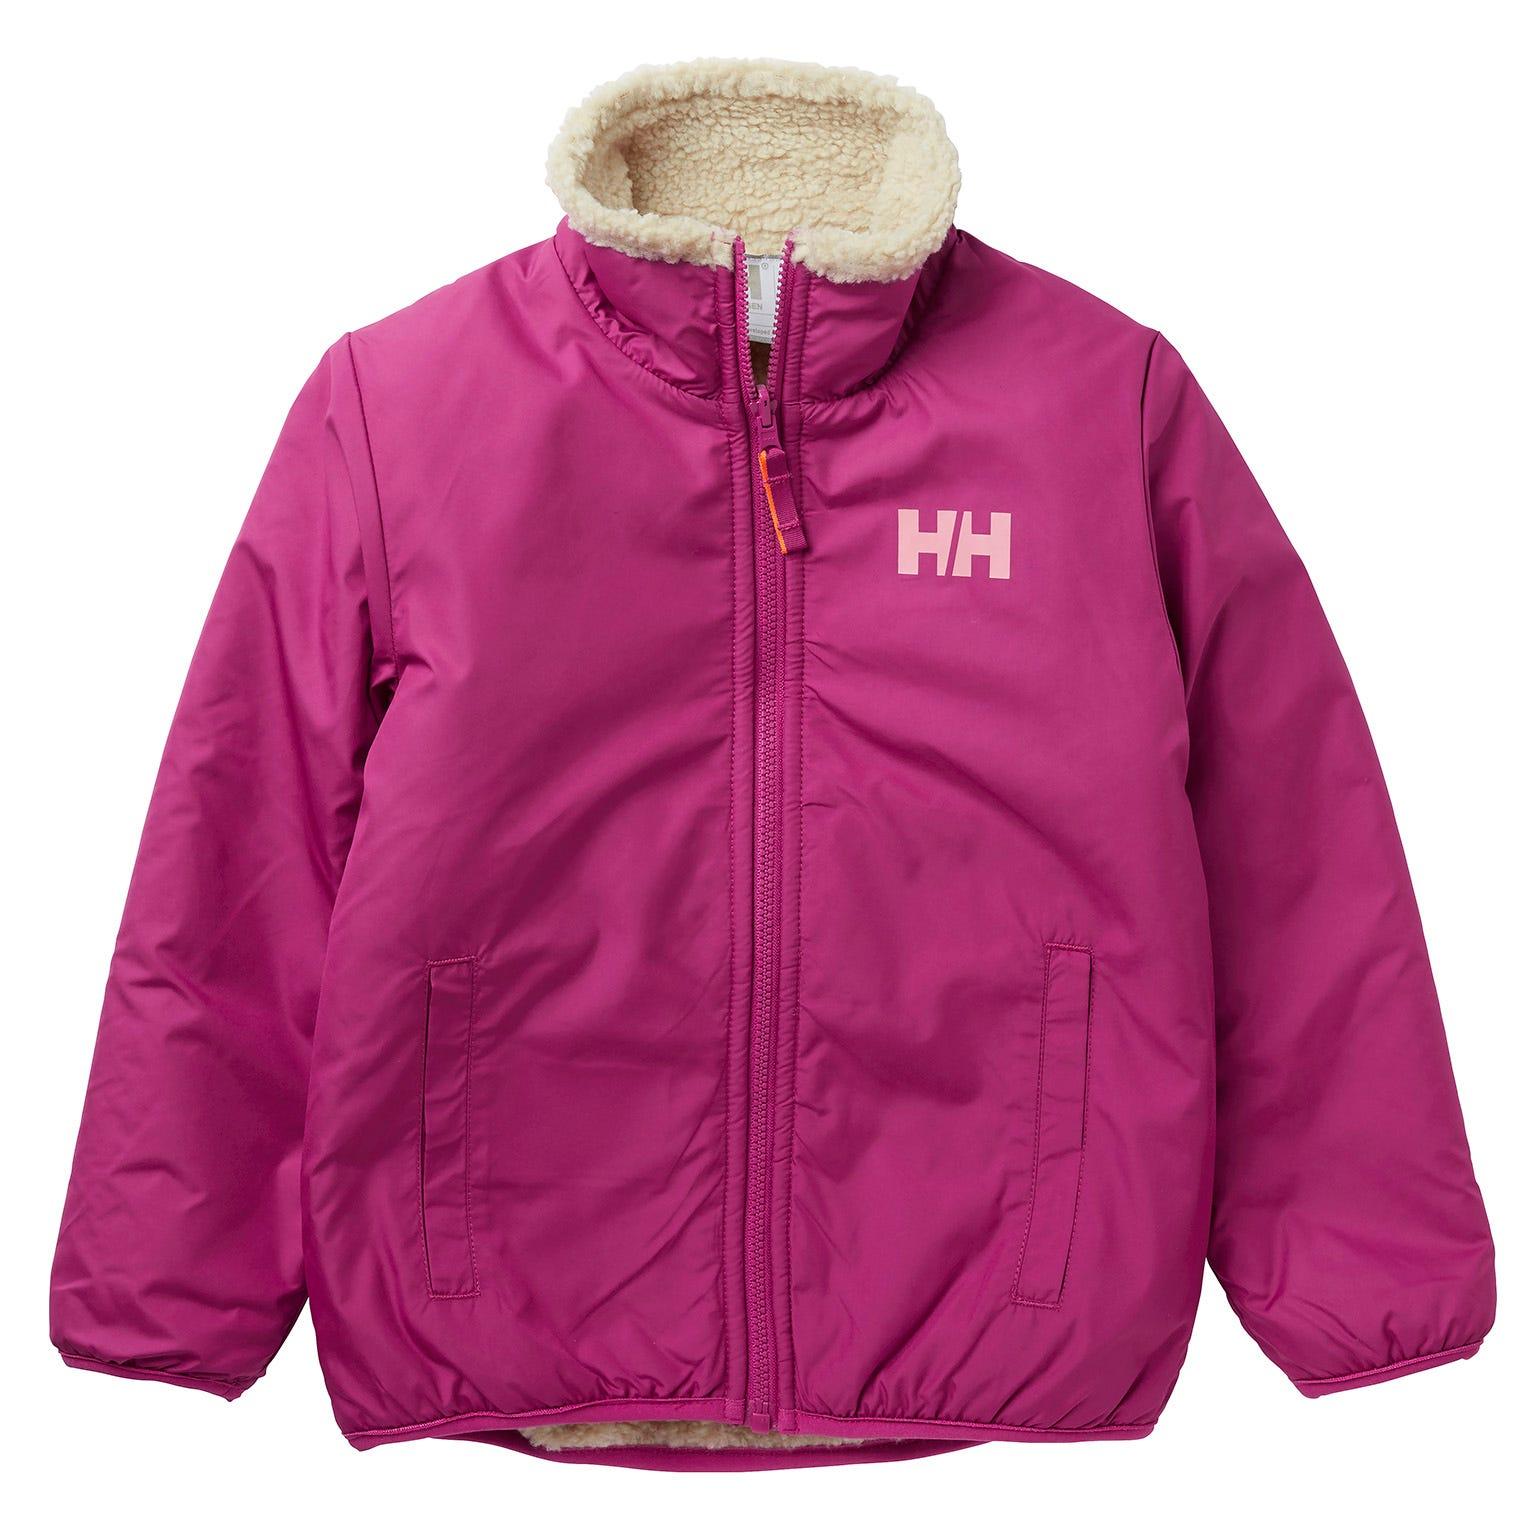 Helly Hansen Kids Reversible Pile Jacket Parka Yellow 86/1